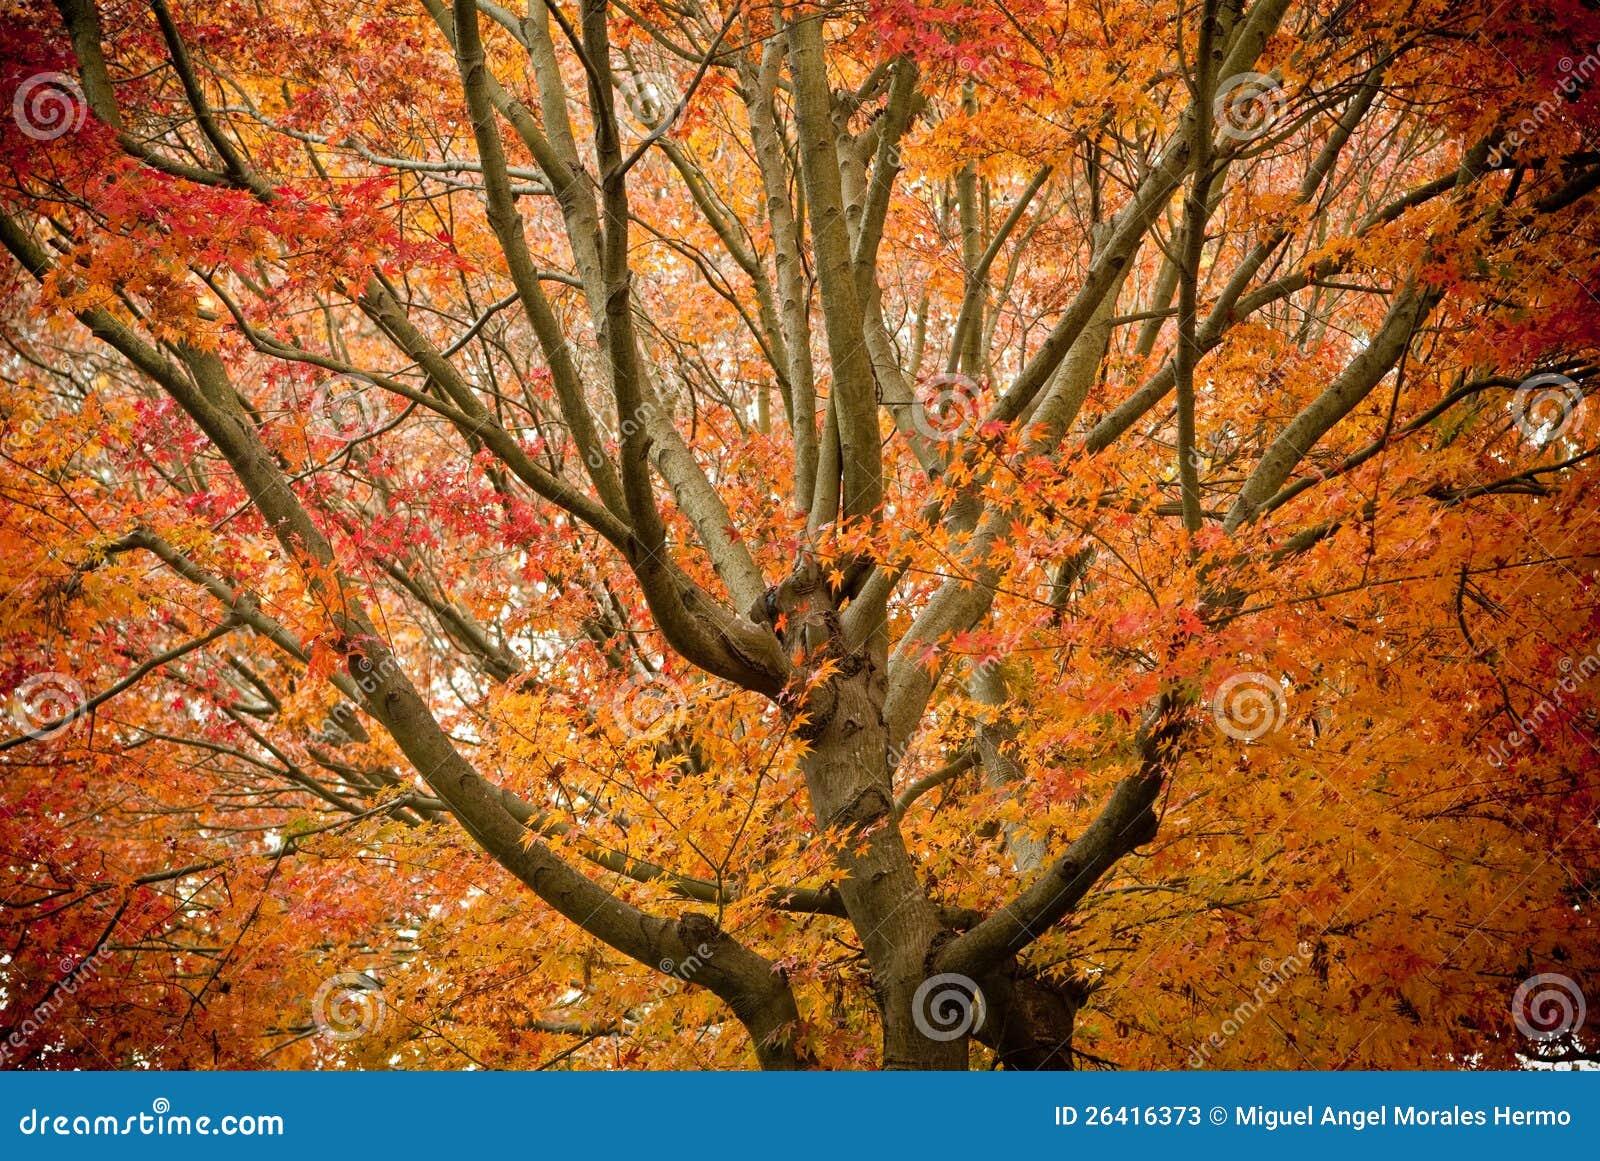 Esplendor del otoño